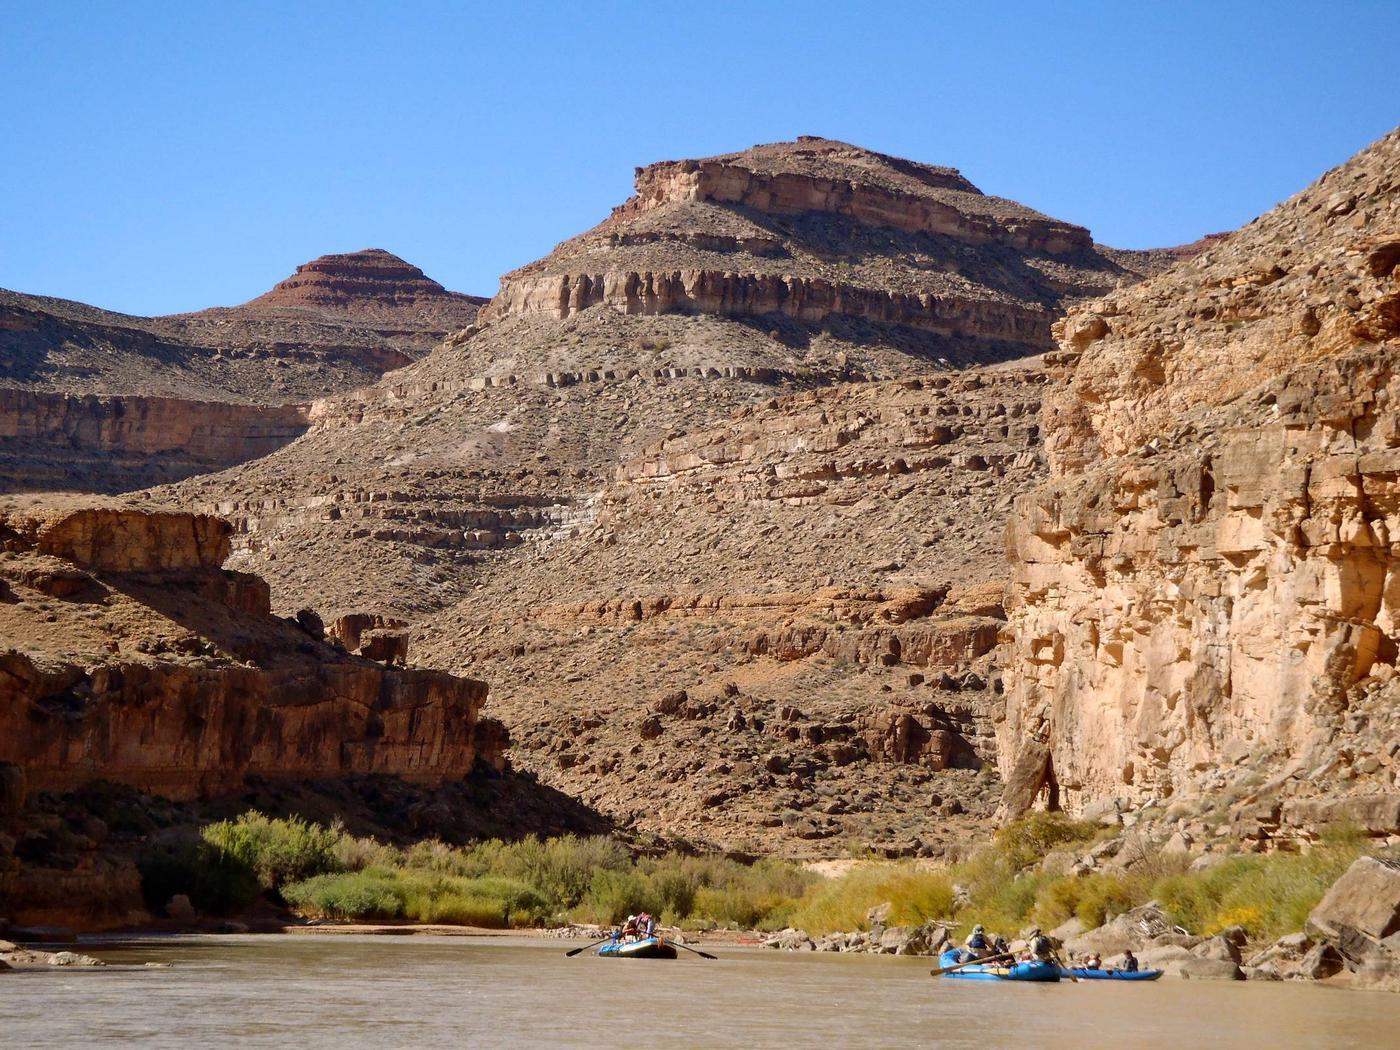 Rafts on the San Juan RiverSan Juan River